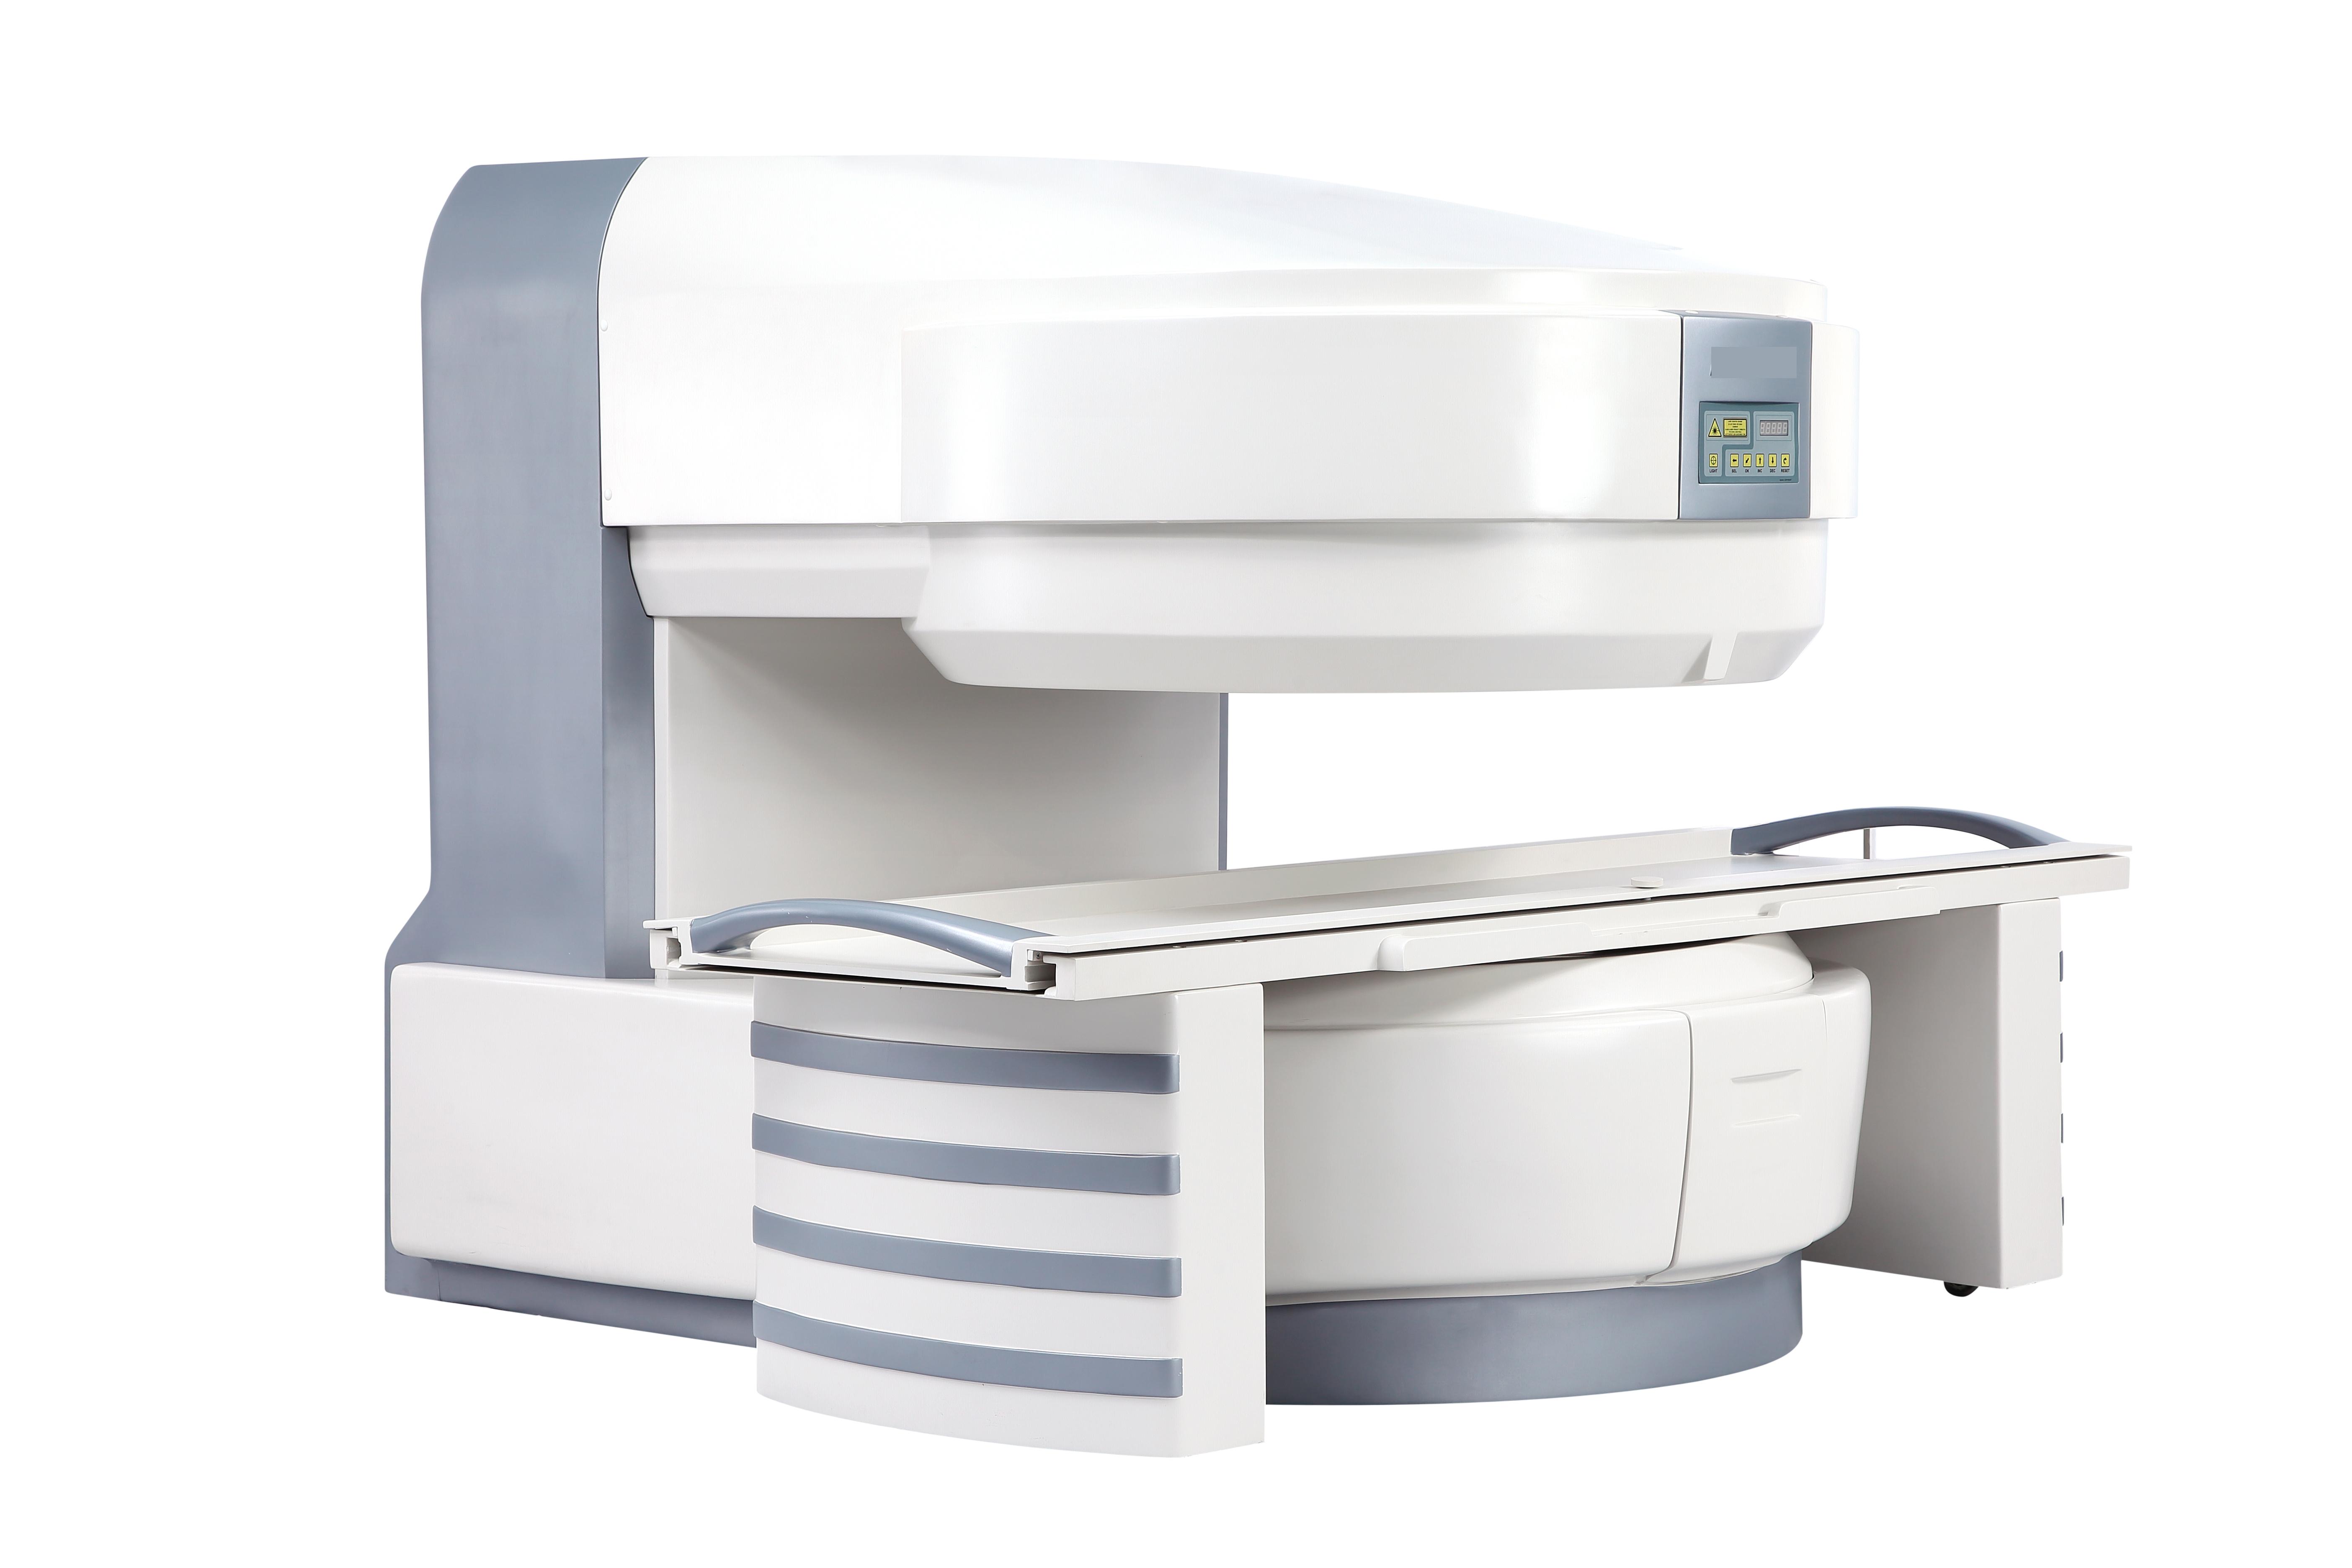 YSMRI-035 0.35T 0.42T Magnetic resonance imaging MRI system